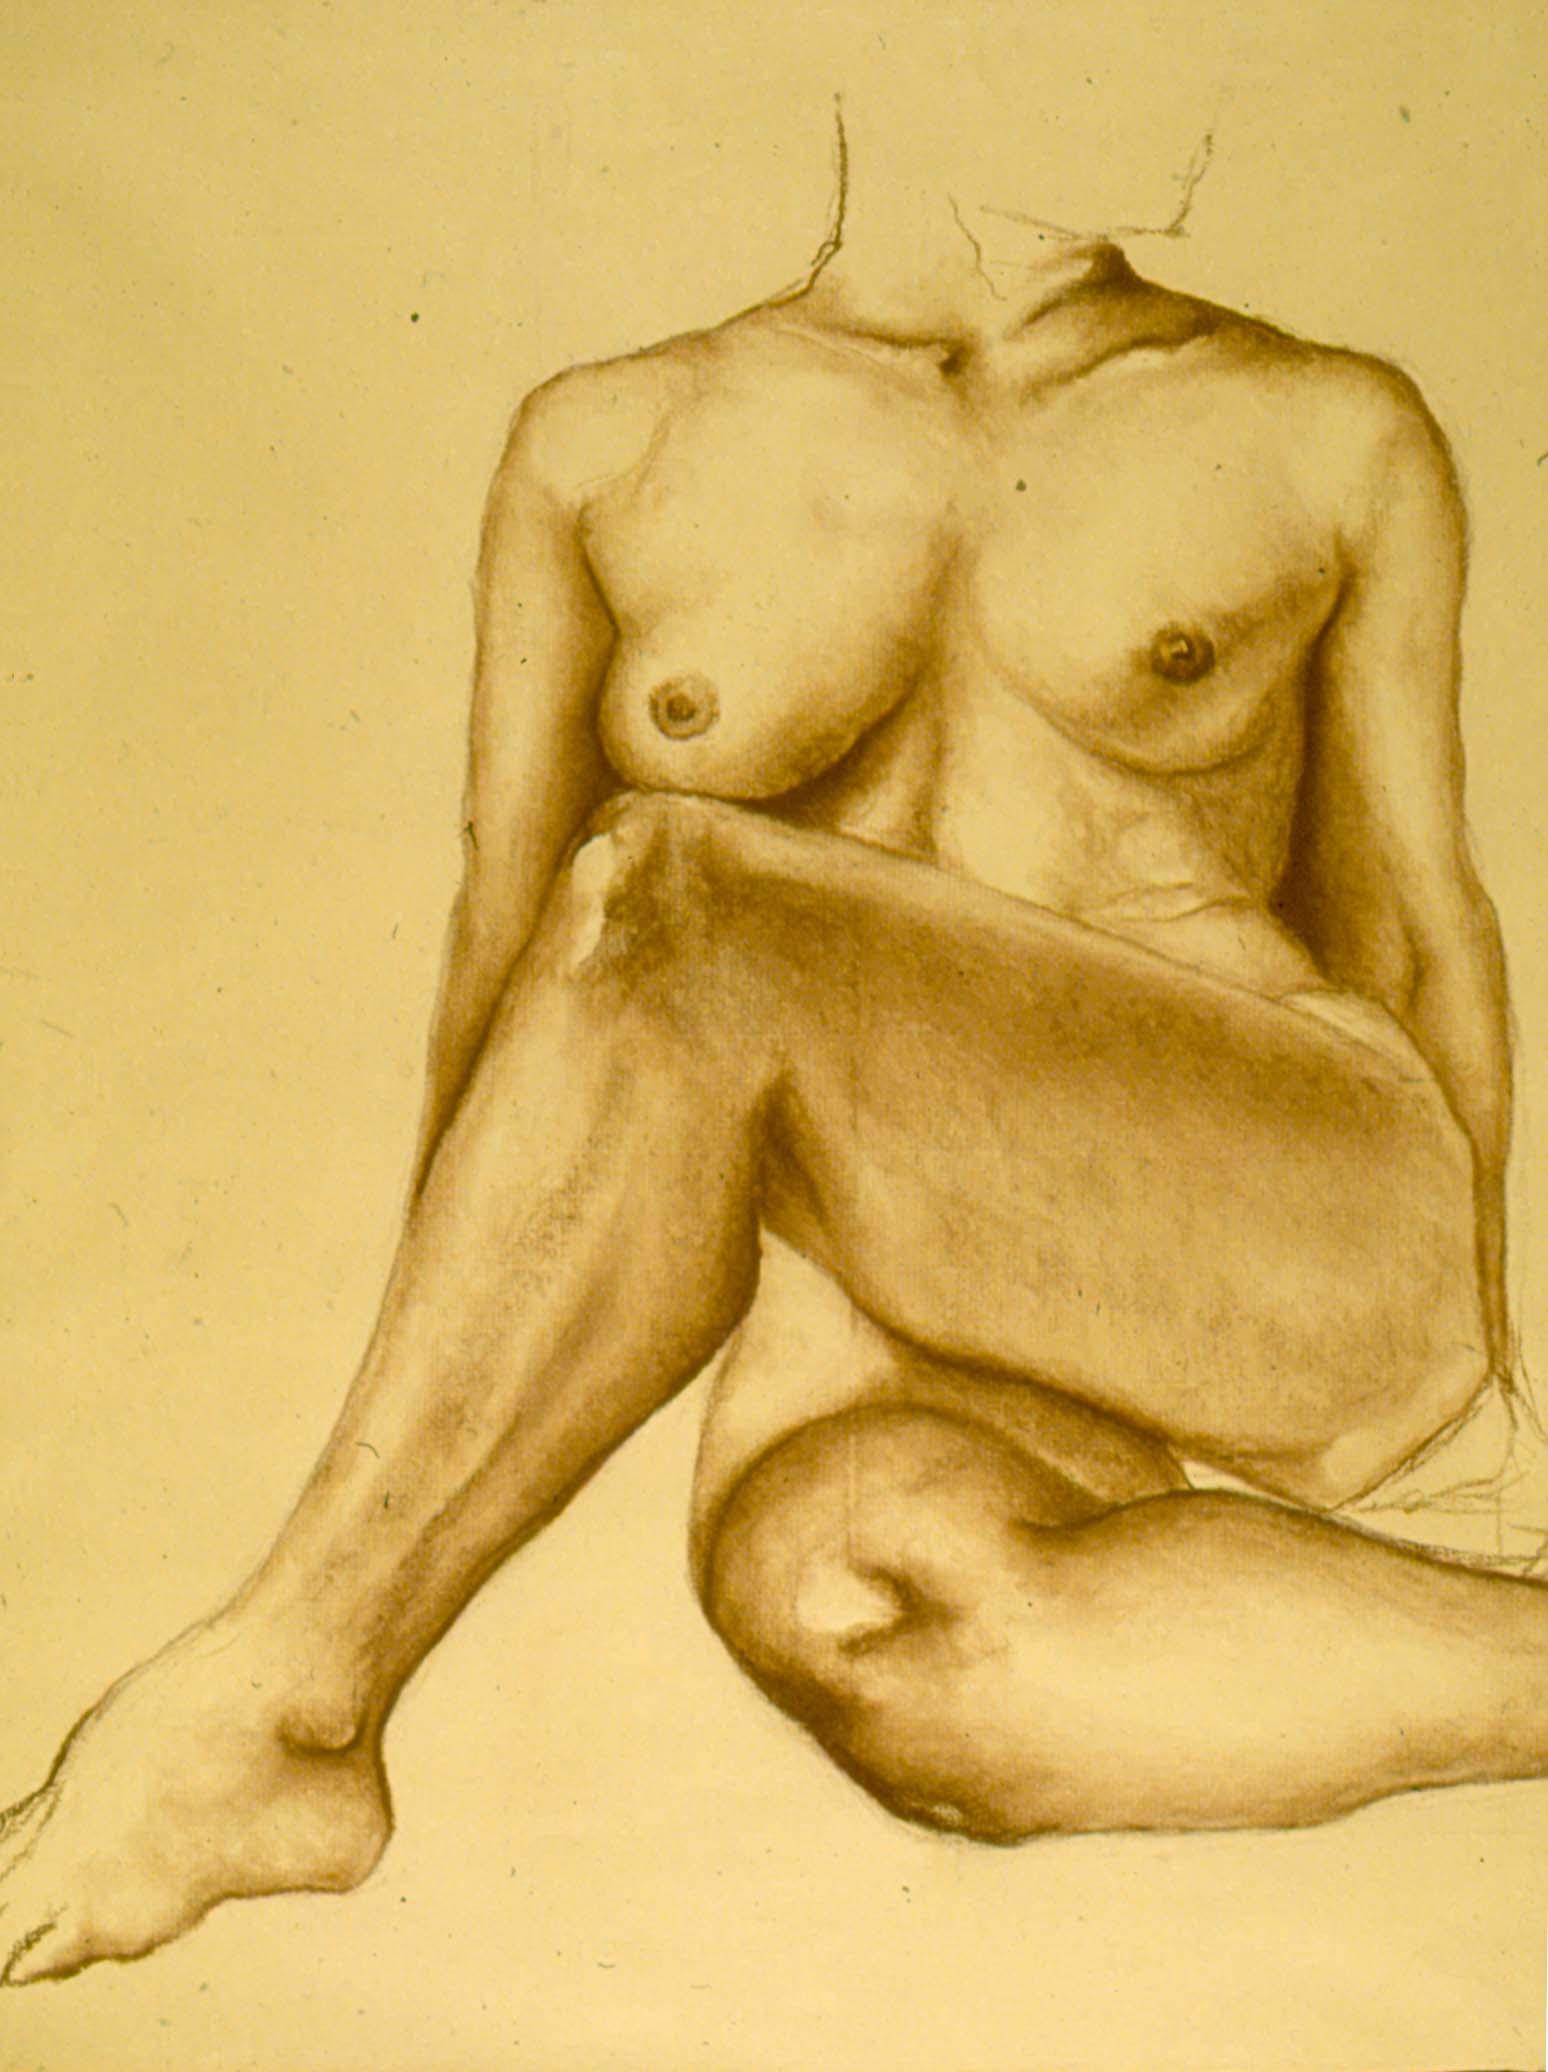 female form lifedrawing - conte crayon